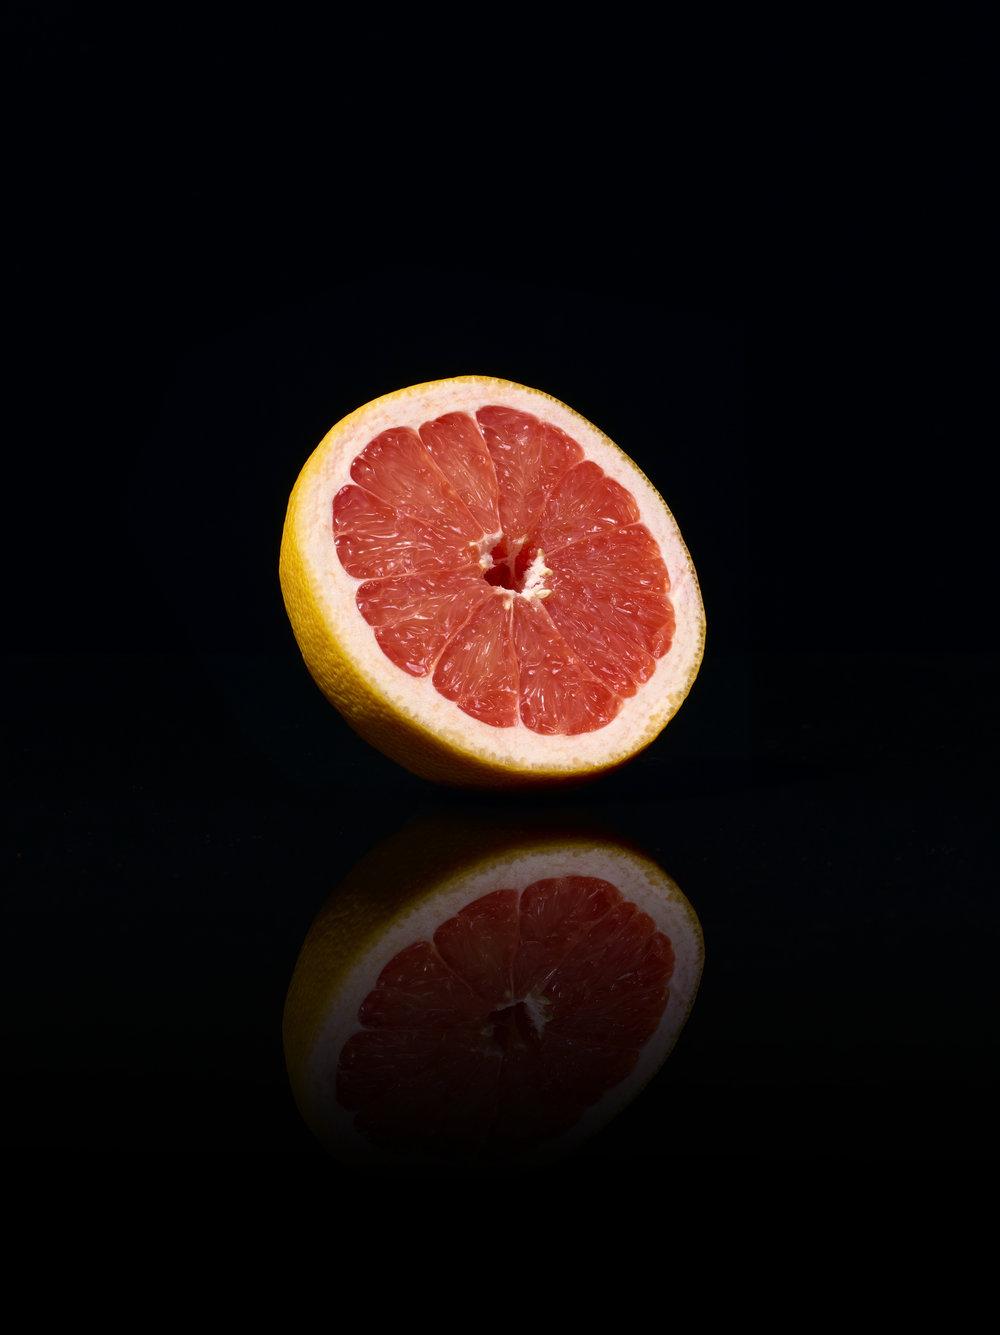 13_04_01_LO_B_grapefruit_042_5M.jpg